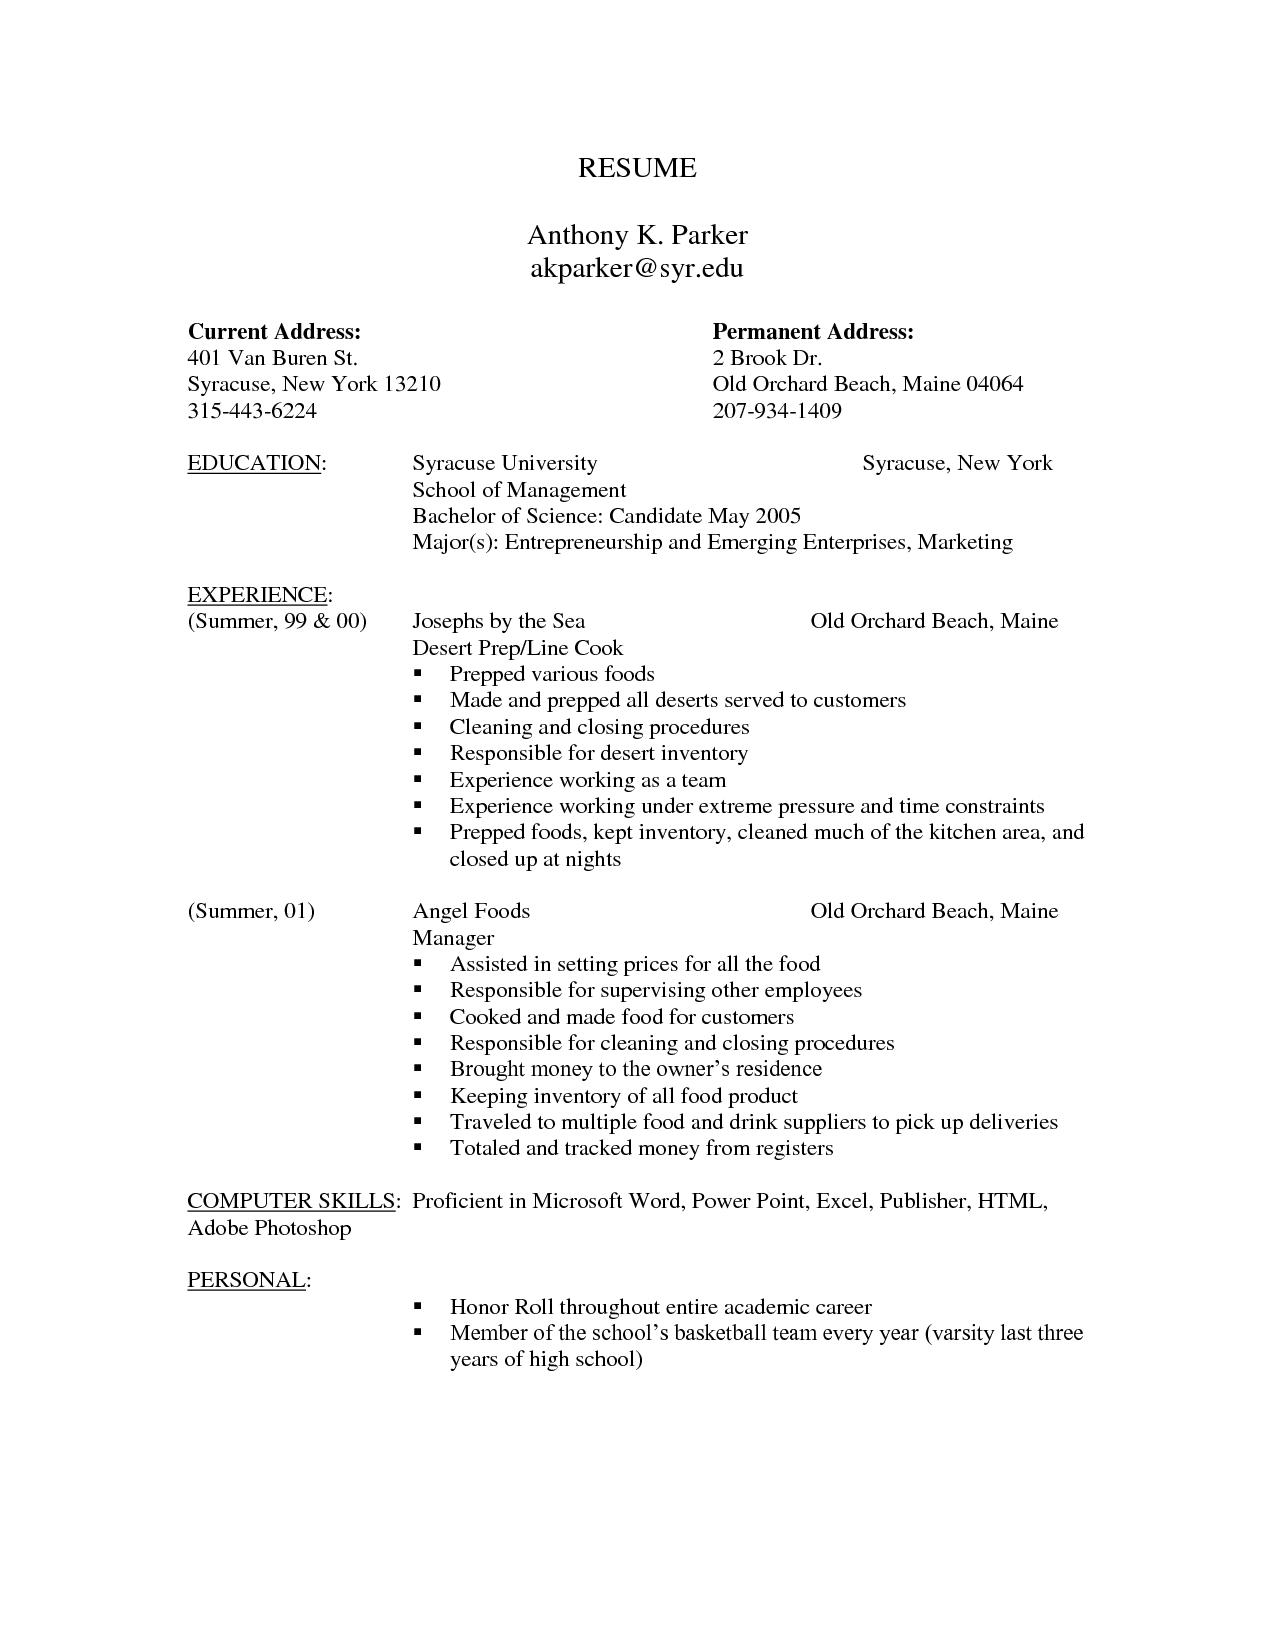 Free Resume Templates  Professional CV Format  Printable Calendar Templates